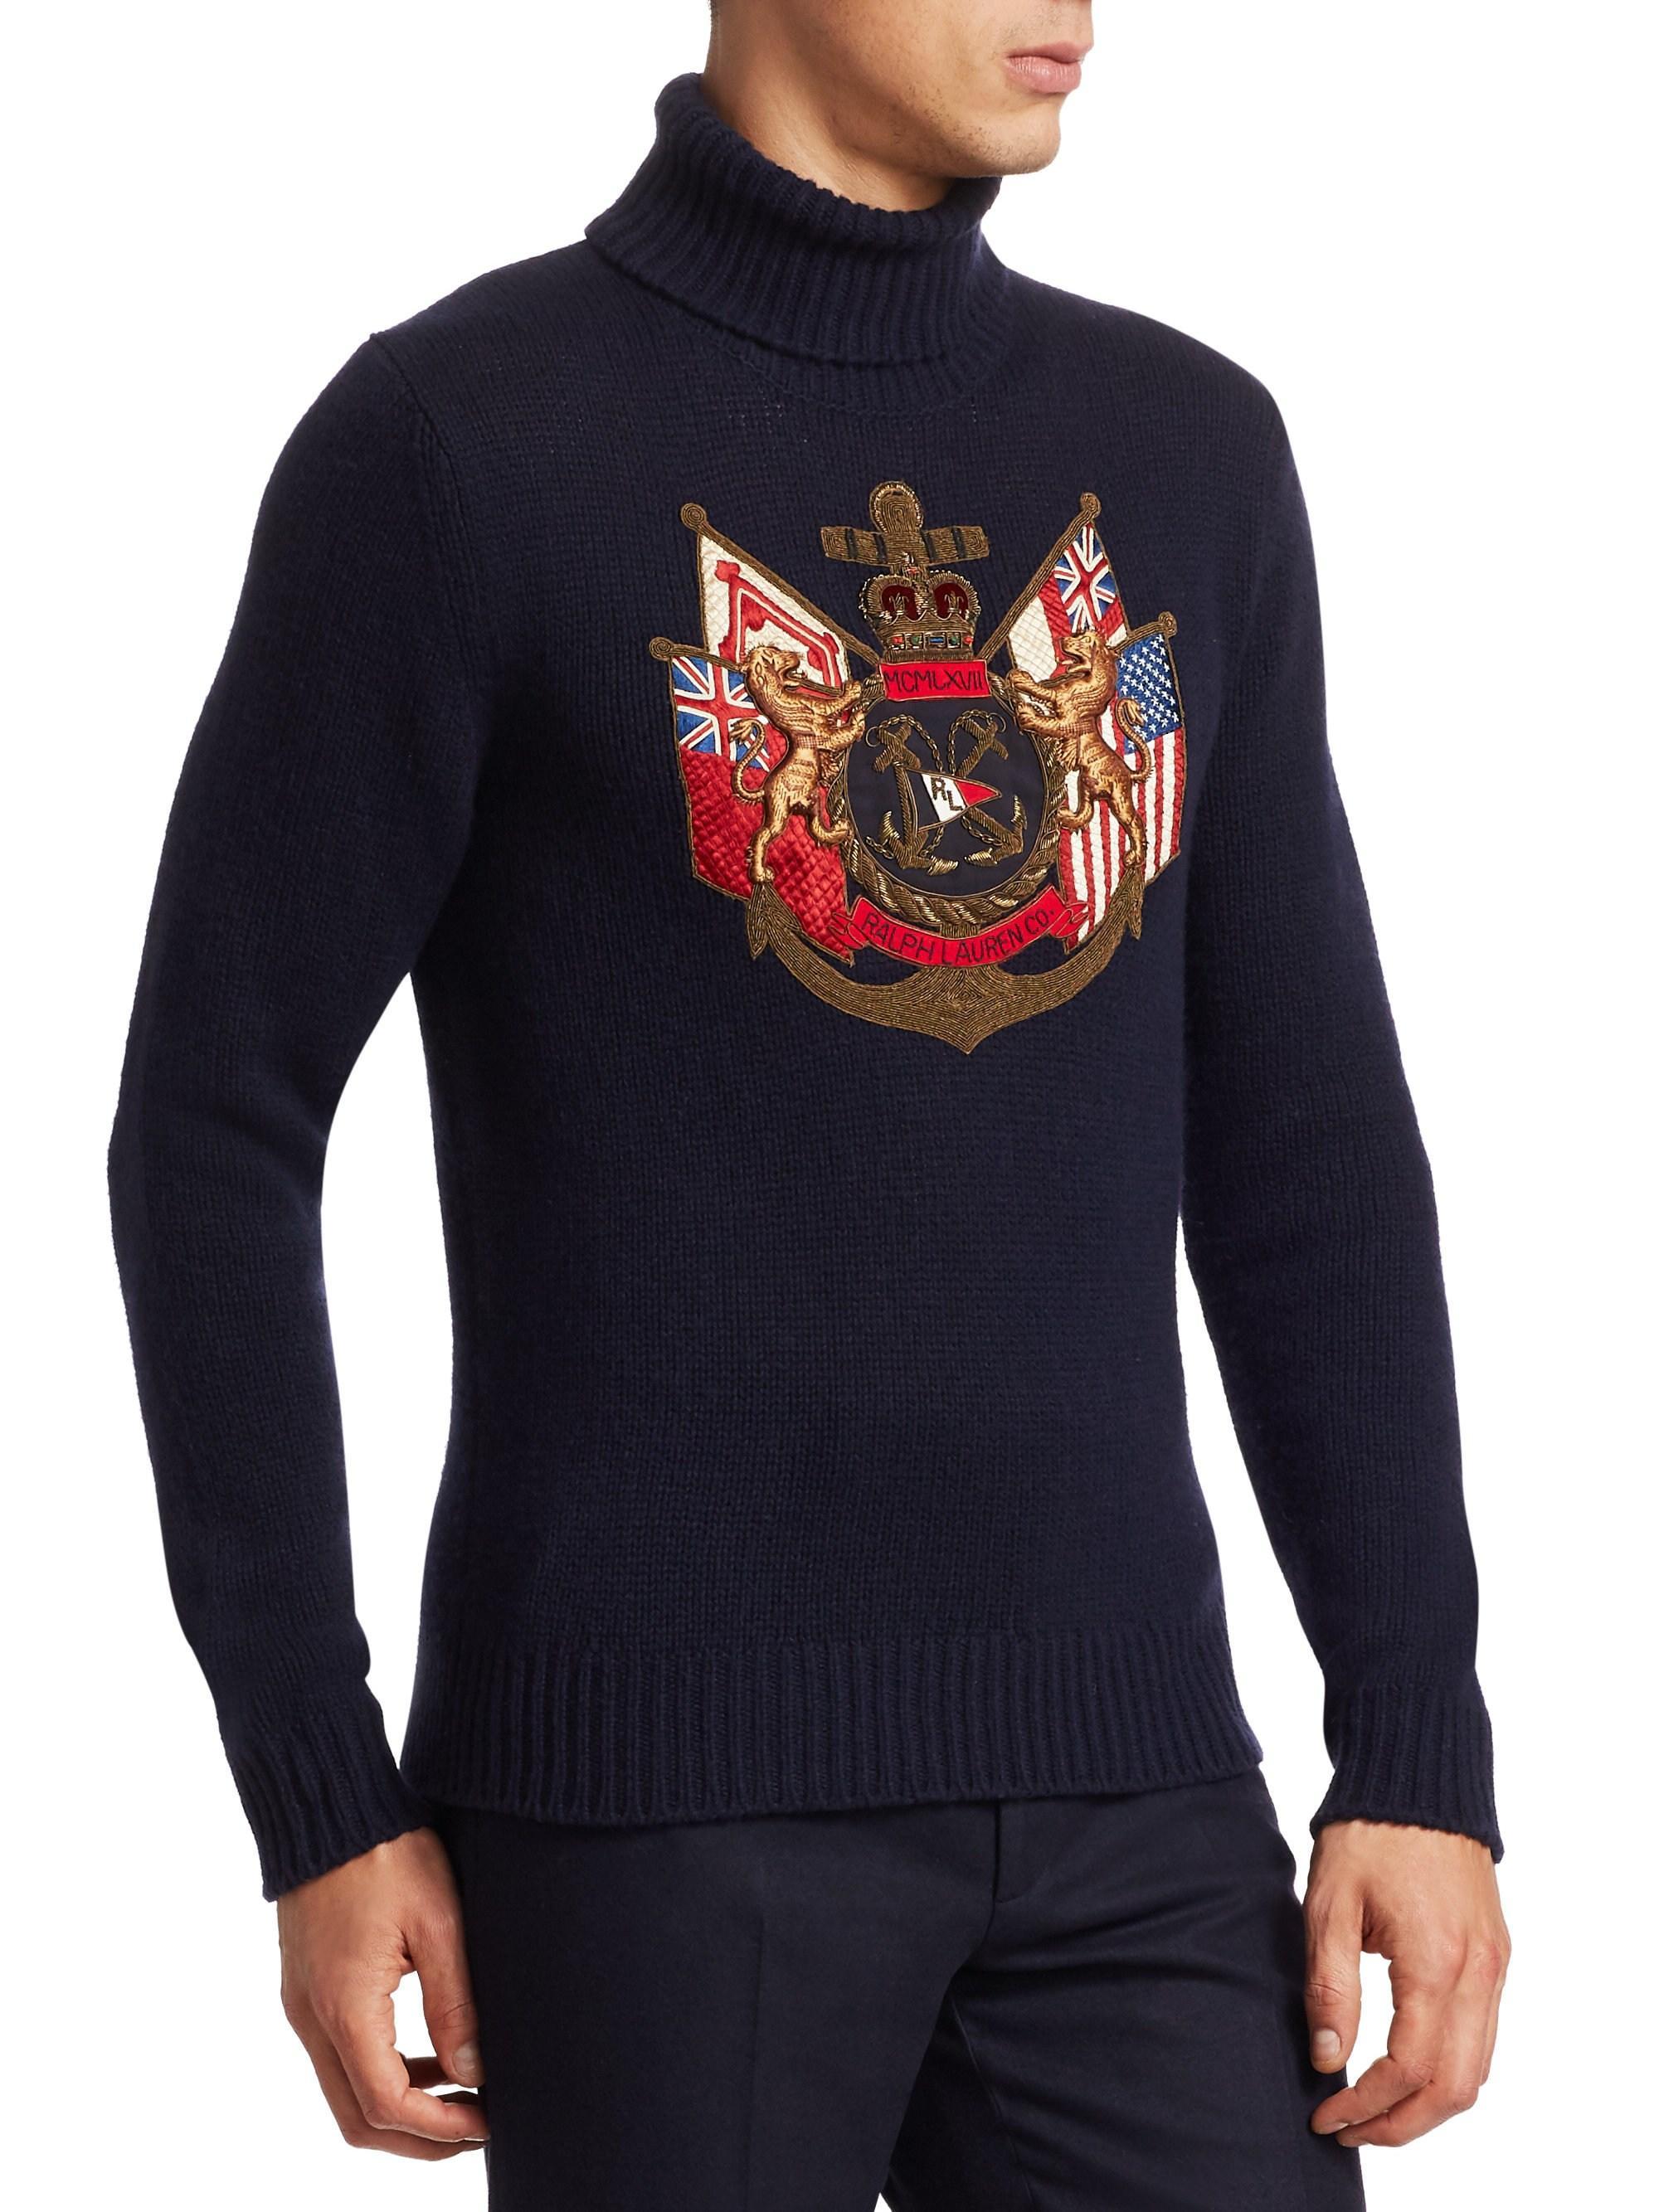 13ca83755 Ralph Lauren Purple Label Men s Embroidered Cashmere Turtleneck ...